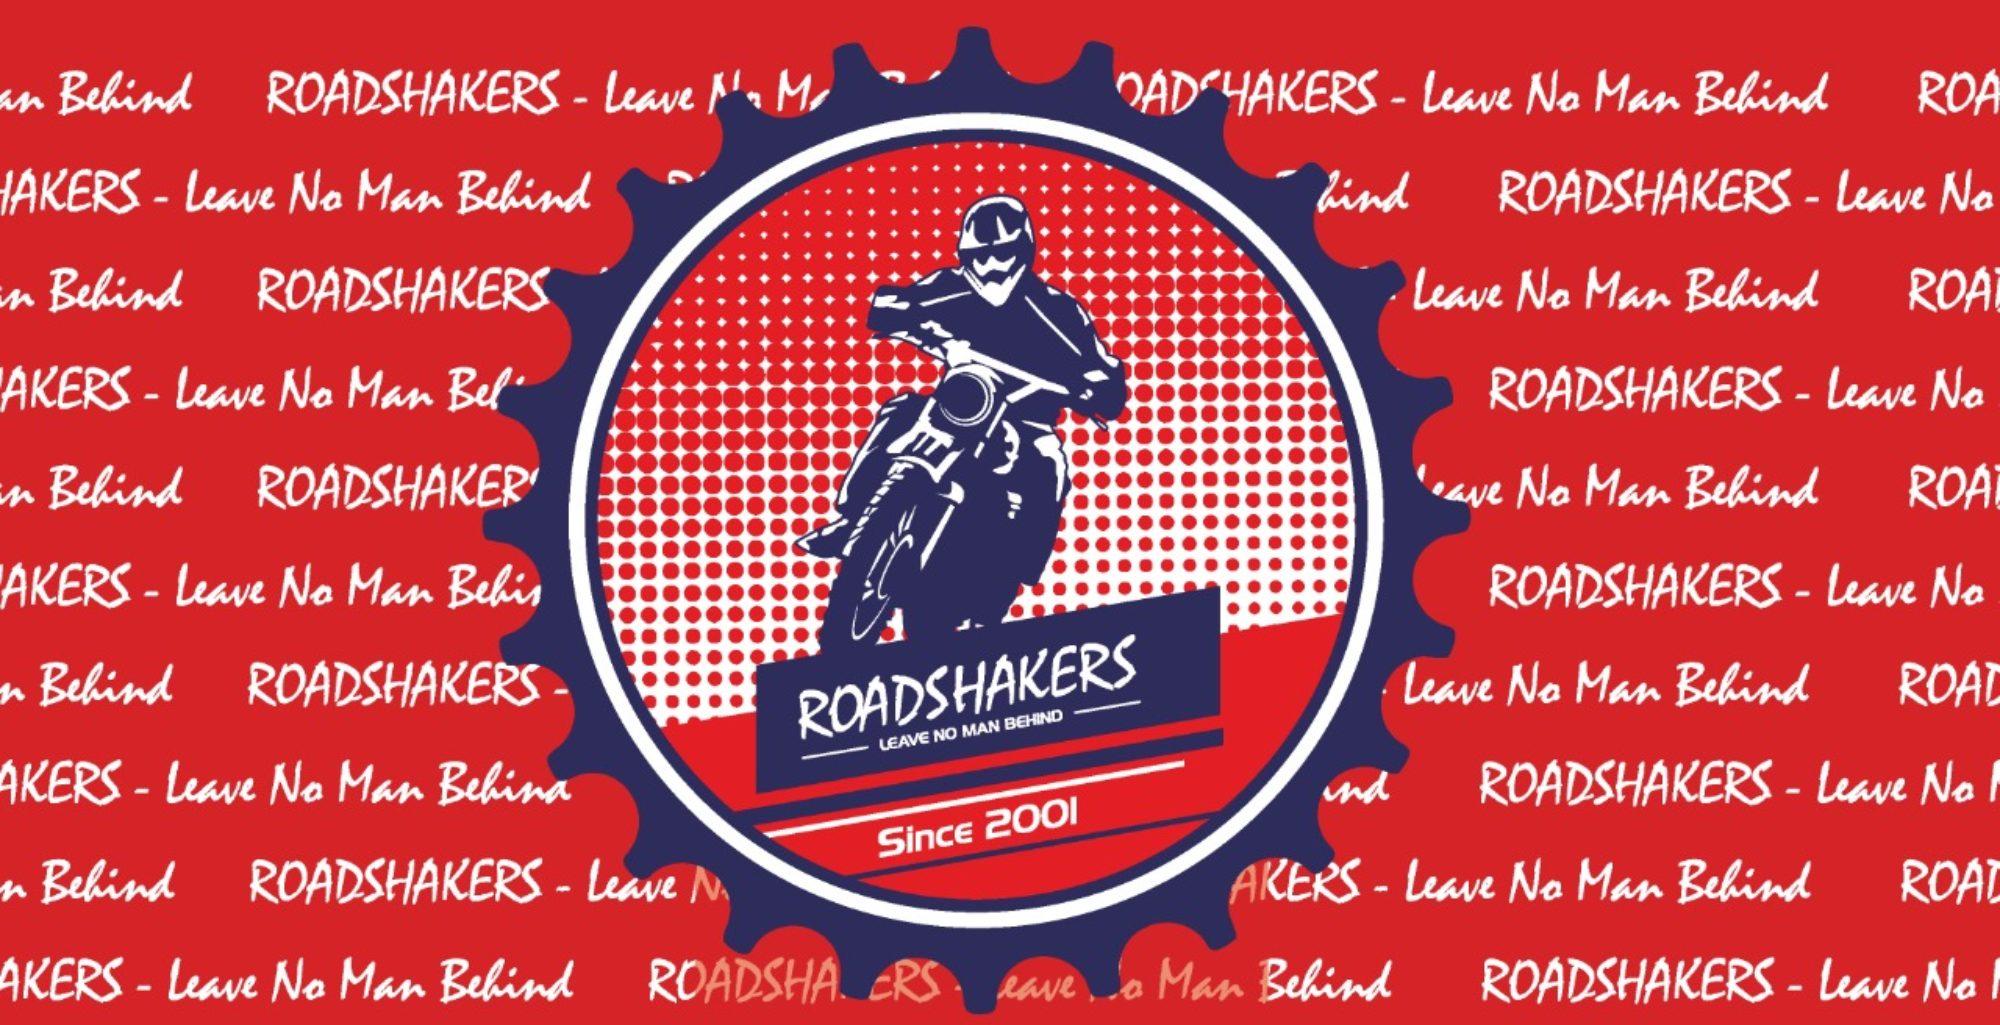 ROADSHAKERS